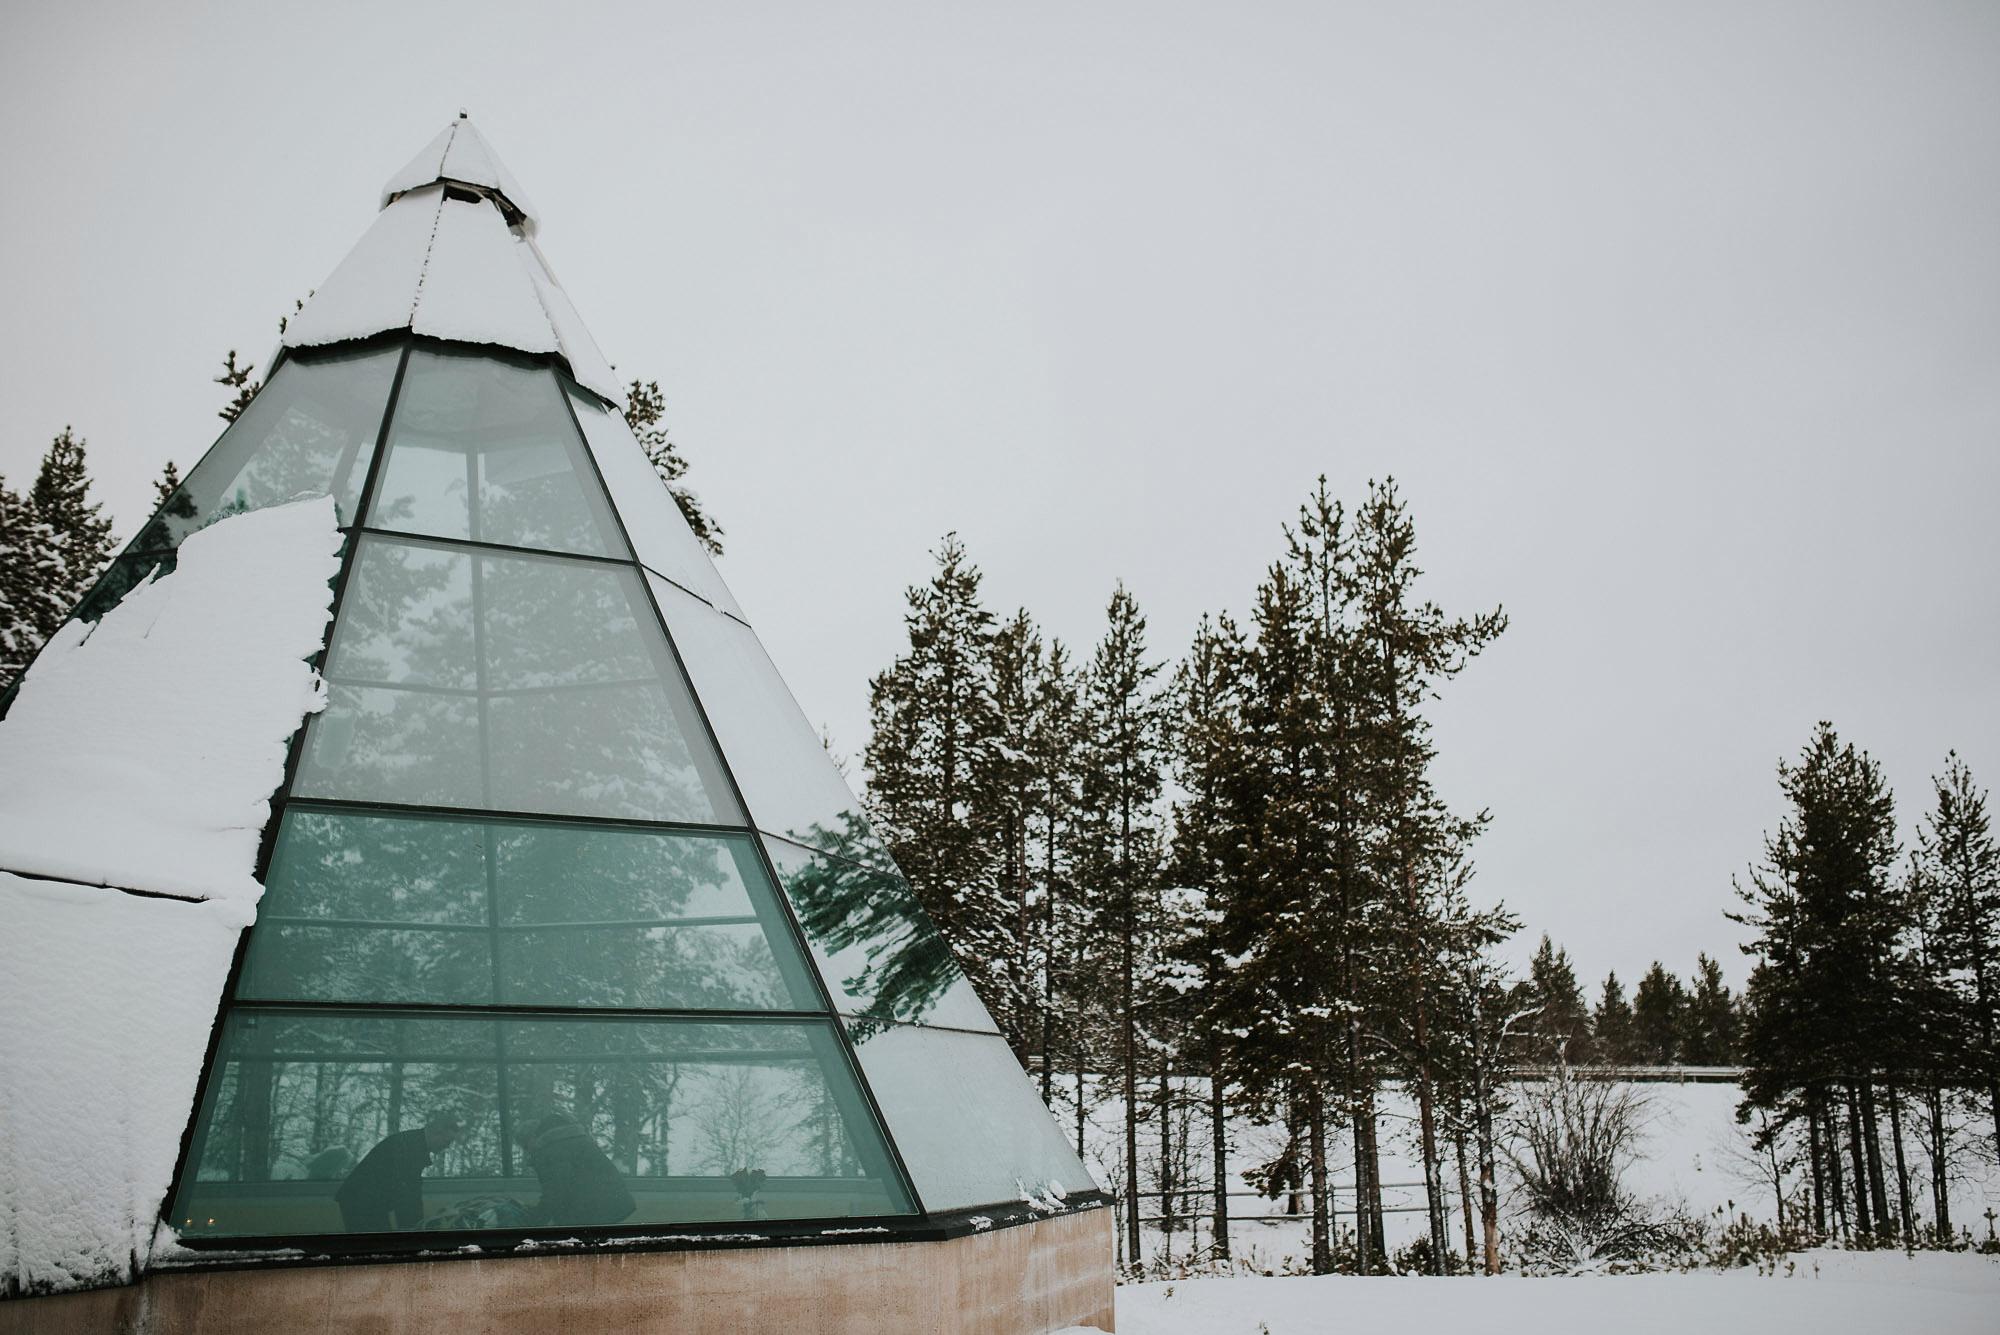 levi-ice-chapel-weddings-lapland-finland-photographer-jere-satamo-010-blog.jpg